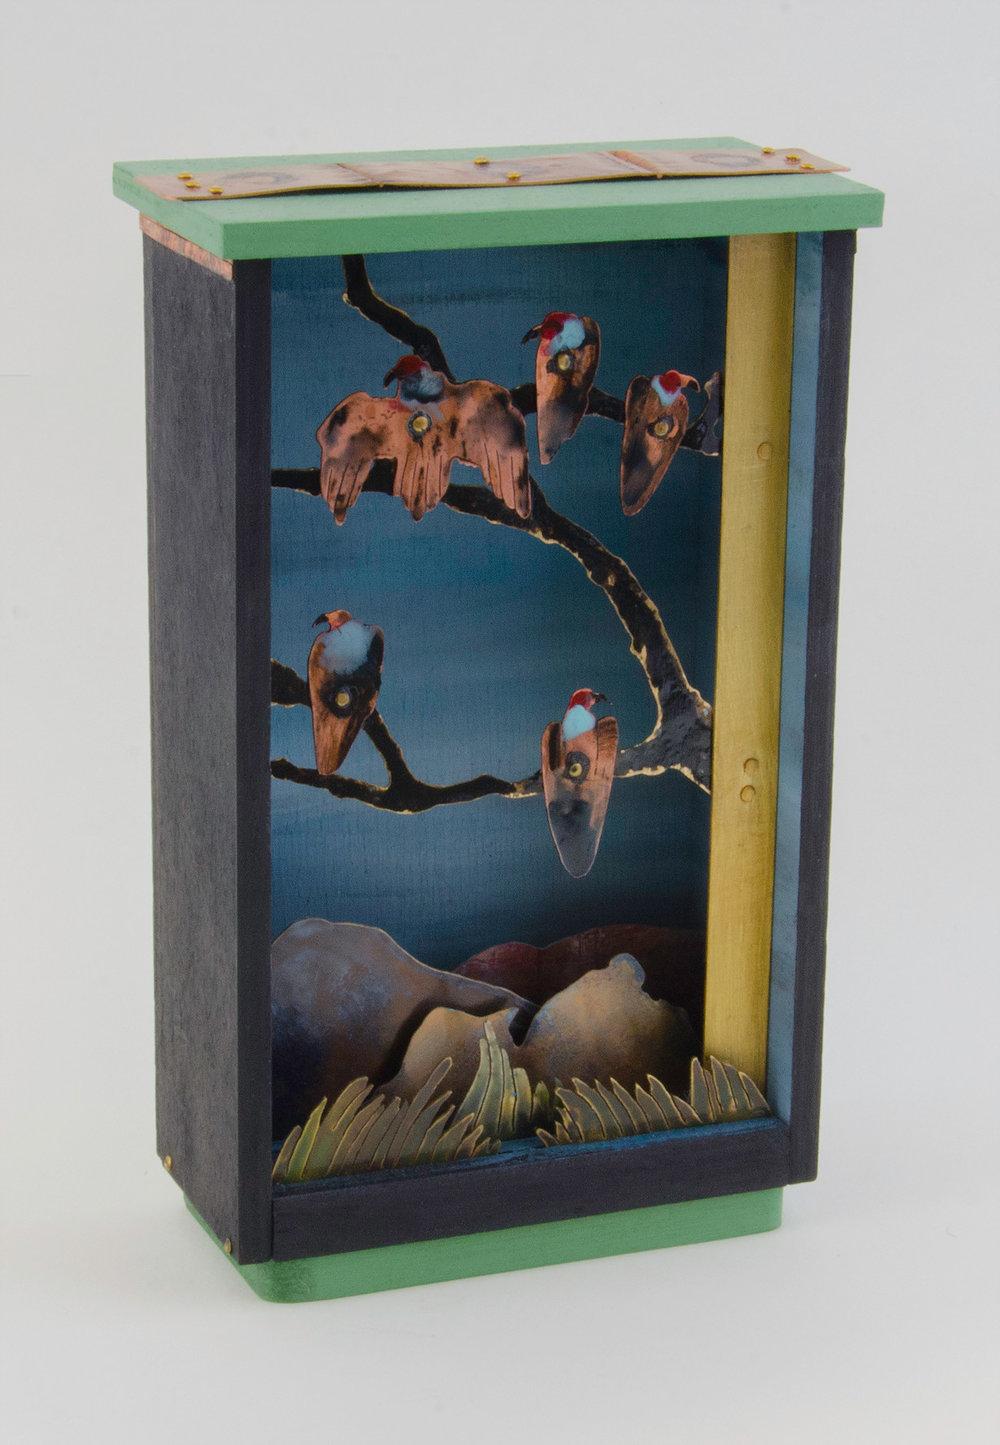 Five Vultures in a Tree - 7_ H x 3_ W x 2_D   .jpg_; filename_=UTF-8''Five Vultures in a Tree - 7_ H x 3_ W x 2_D    (1).jpg